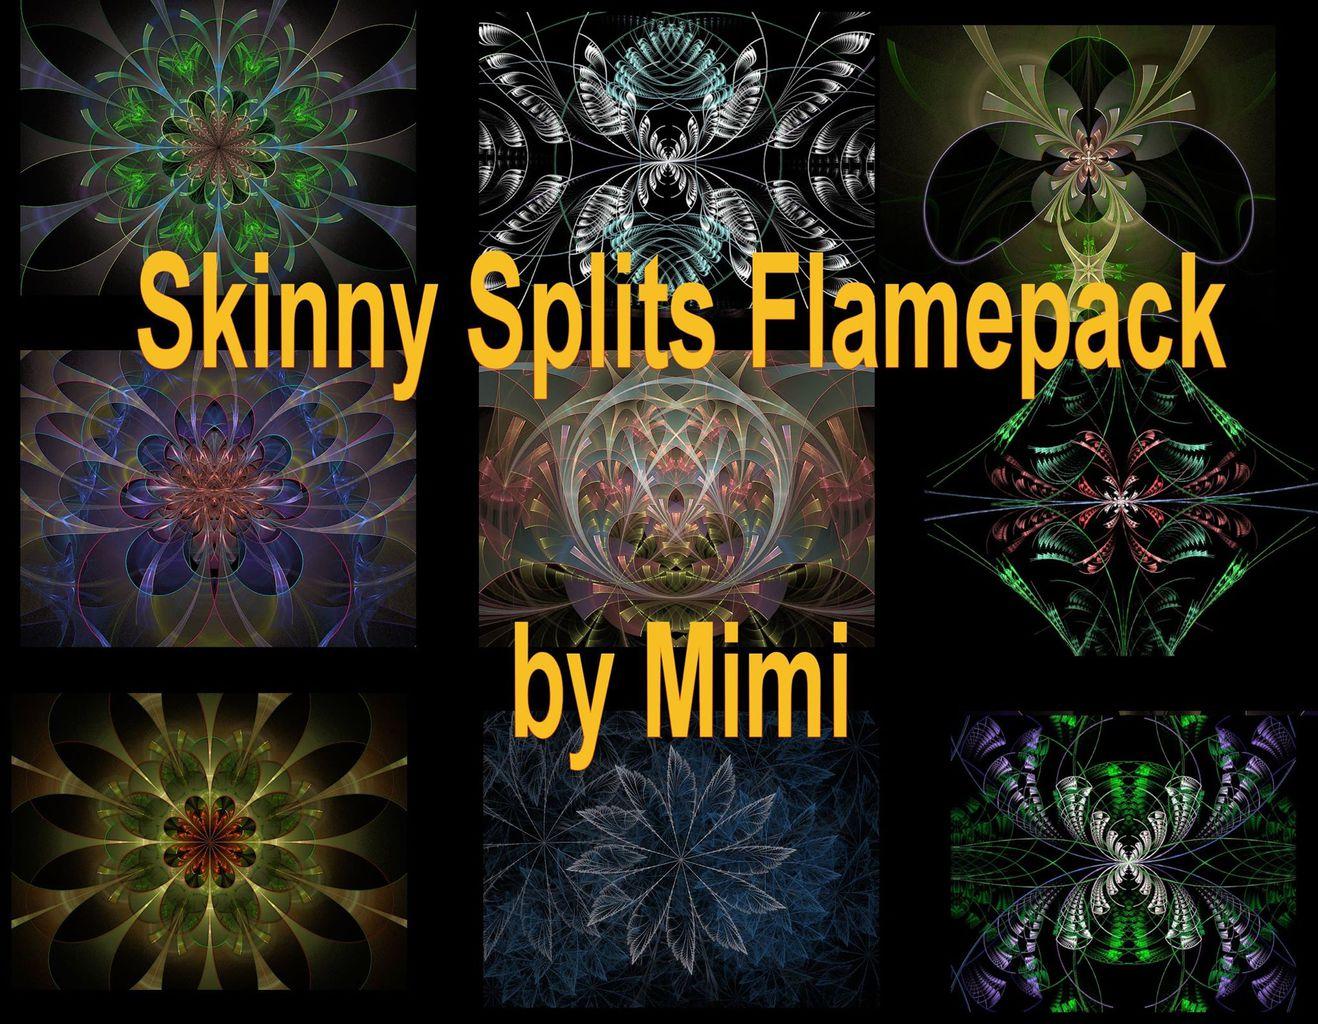 skinny splits flamepack mimi | Skinny Splits Flame Pack - Mi Mi